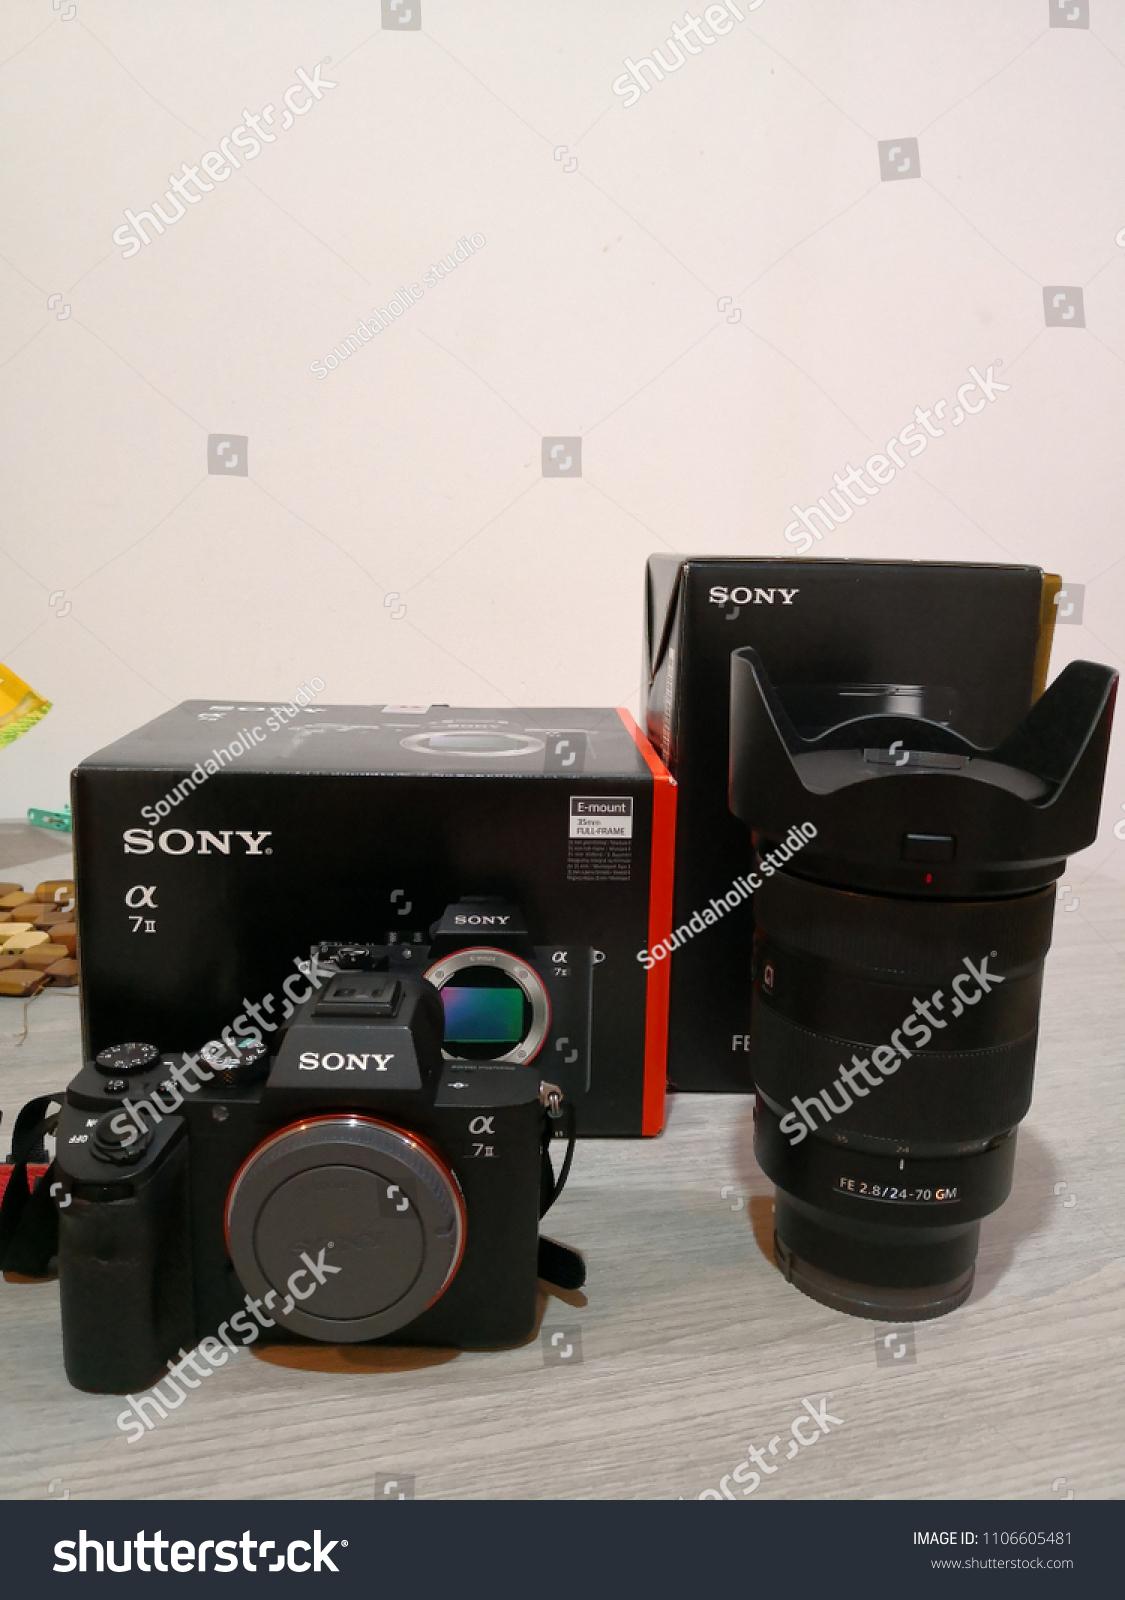 Bangkok Thailand May 25 2018 Sony Alpha Stock Photo Edit Now A7r Ii Body A7 Mirrorless Digital Camera